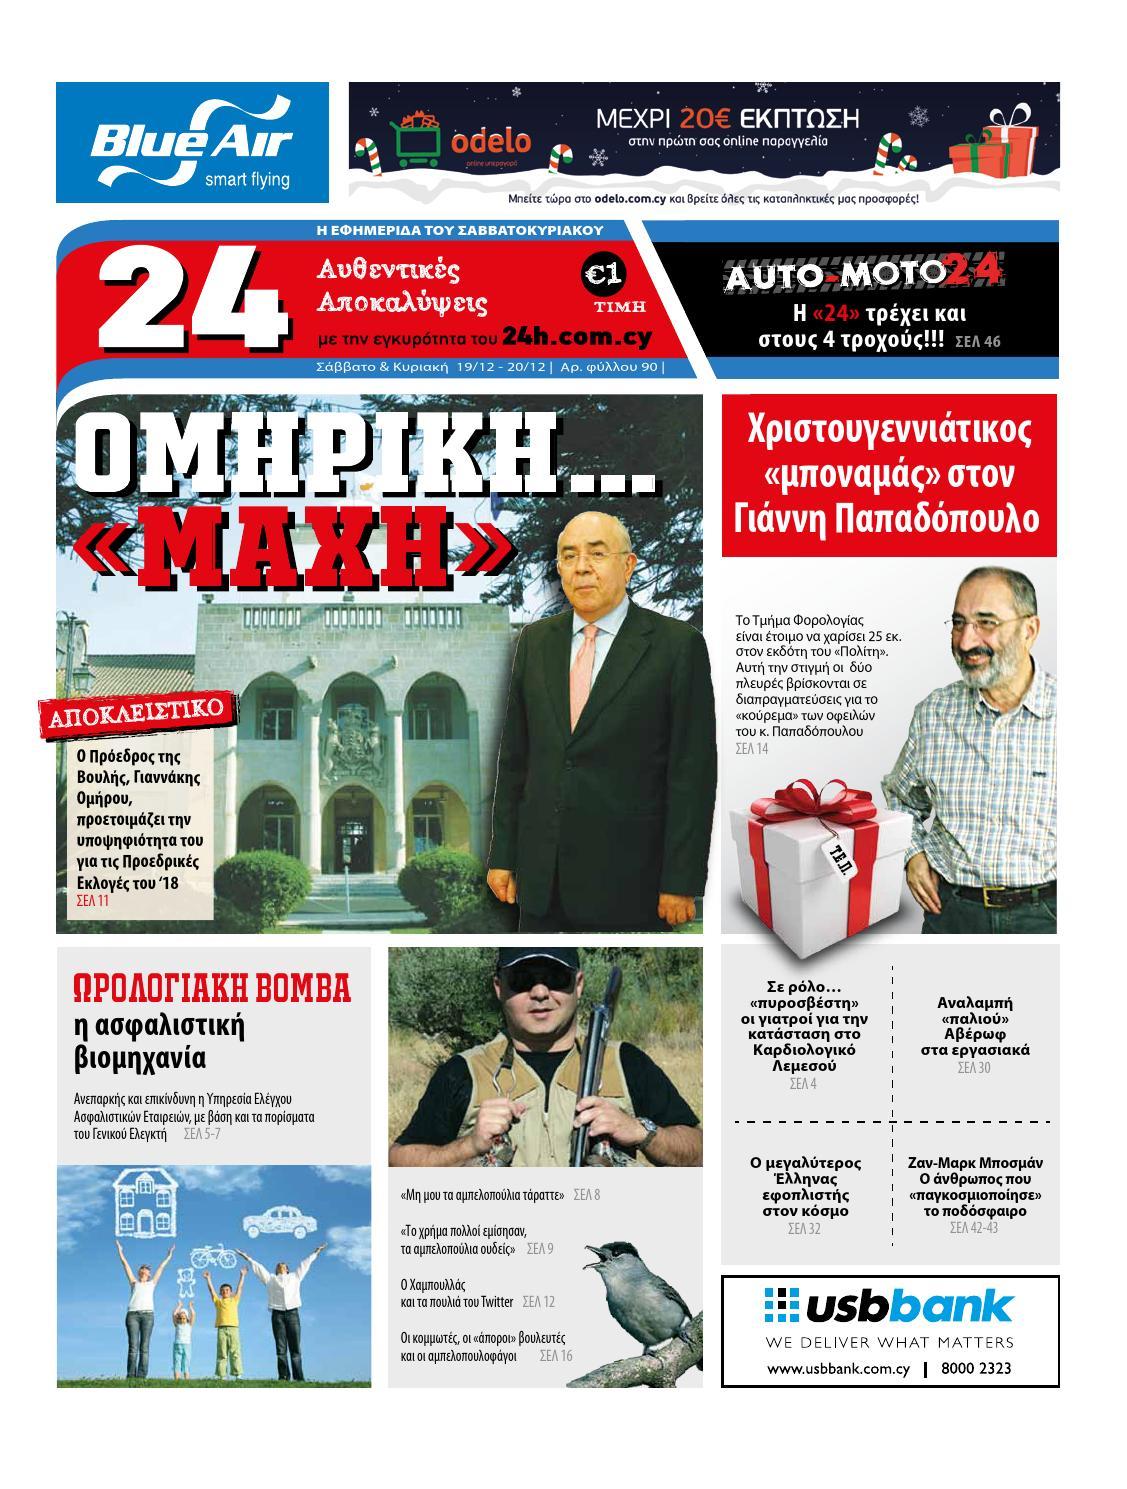 f14664dade3 Εφημερίδα 24 - Φύλλο 90 - 19 Δεκεμβρίου 2016 by Newspaper 24 - issuu